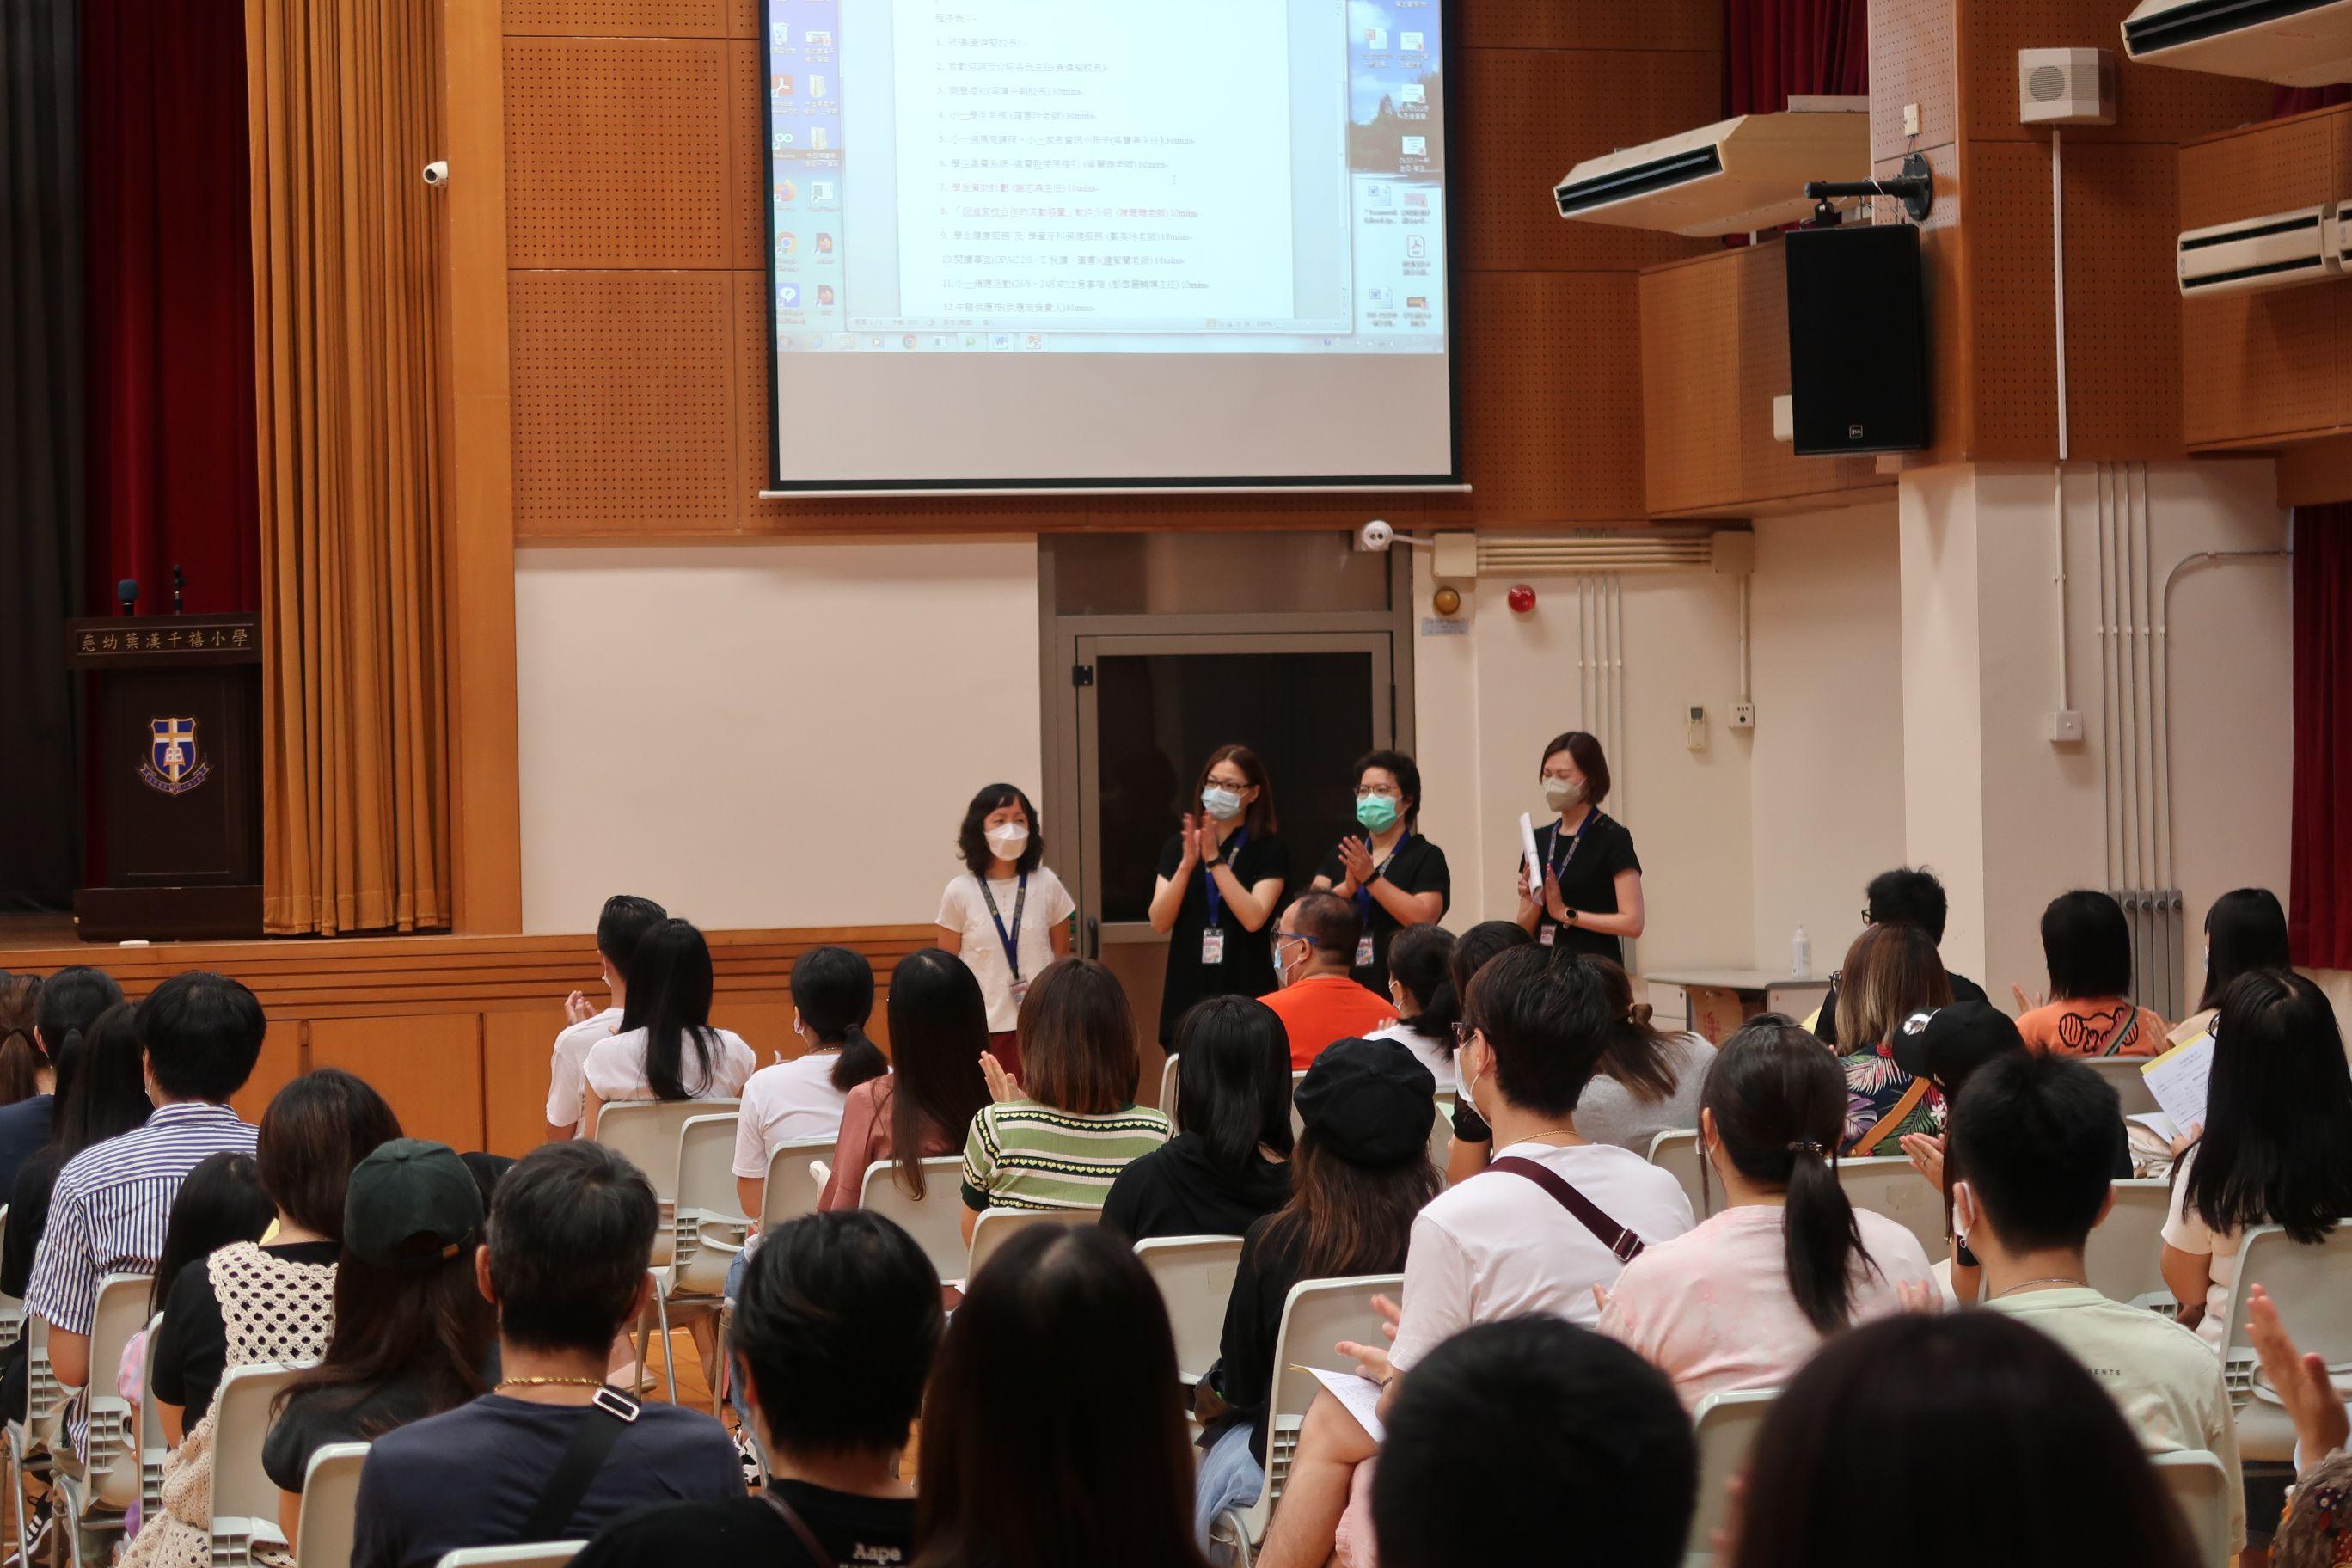 https://syh.edu.hk/sites/default/files/img_6594.jpg